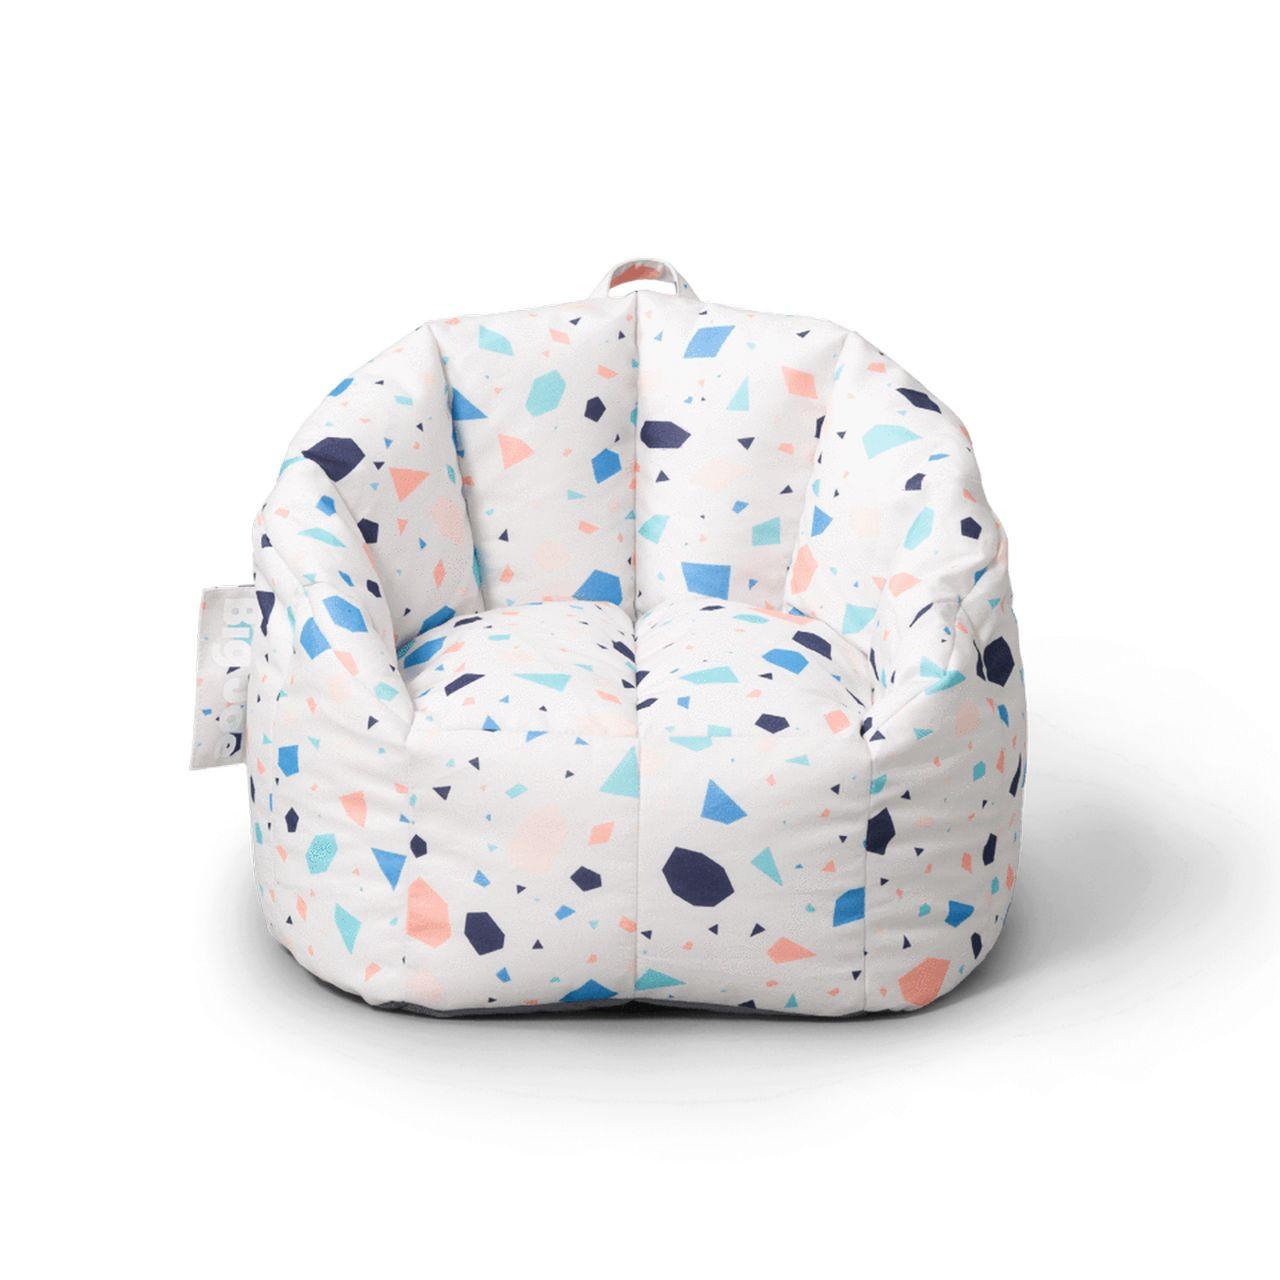 Big Joe Milano Kid's Bean Bag - Dolce Terrazzo Lenox